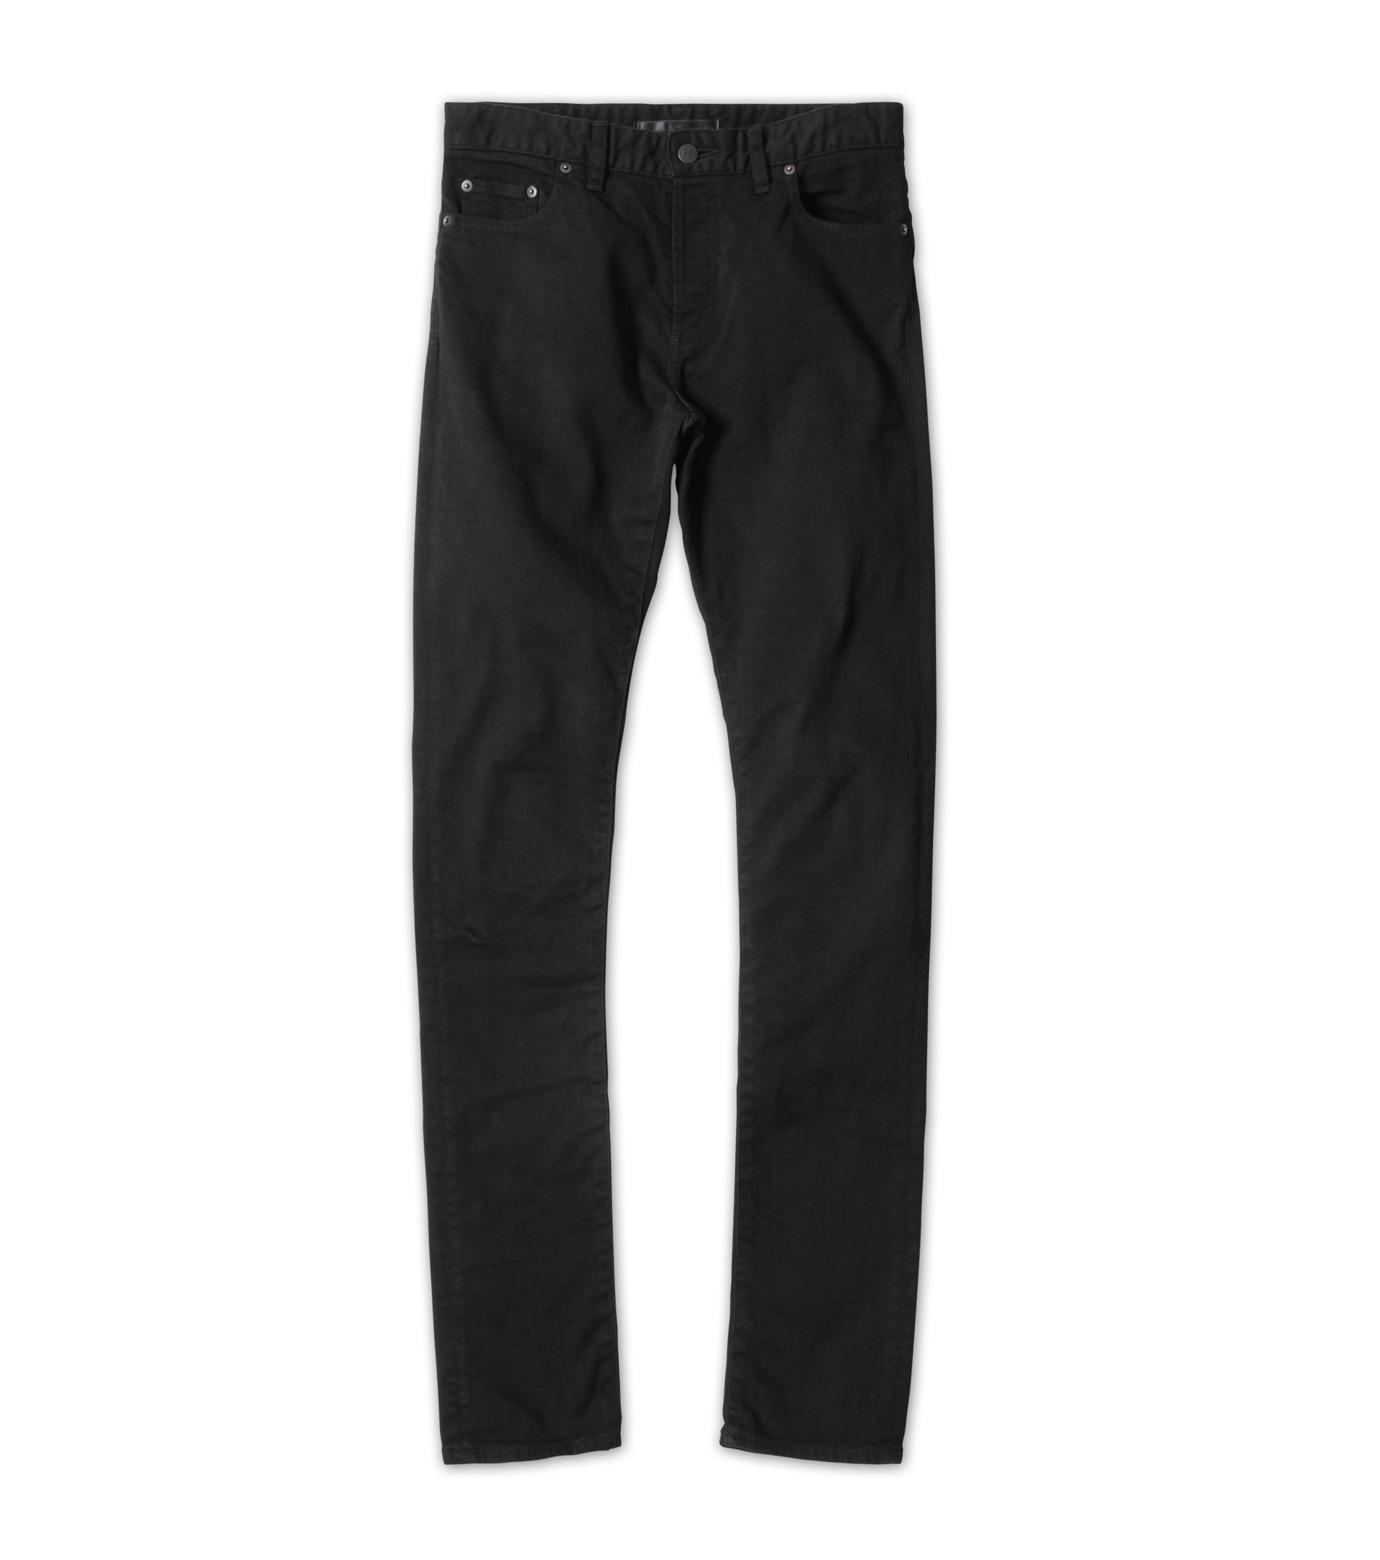 HL HEDDIE LOVU(エイチエル・エディールーヴ)のHL skinslim-BLACK(パンツ/pants)-HL-skinslim-13 拡大詳細画像6